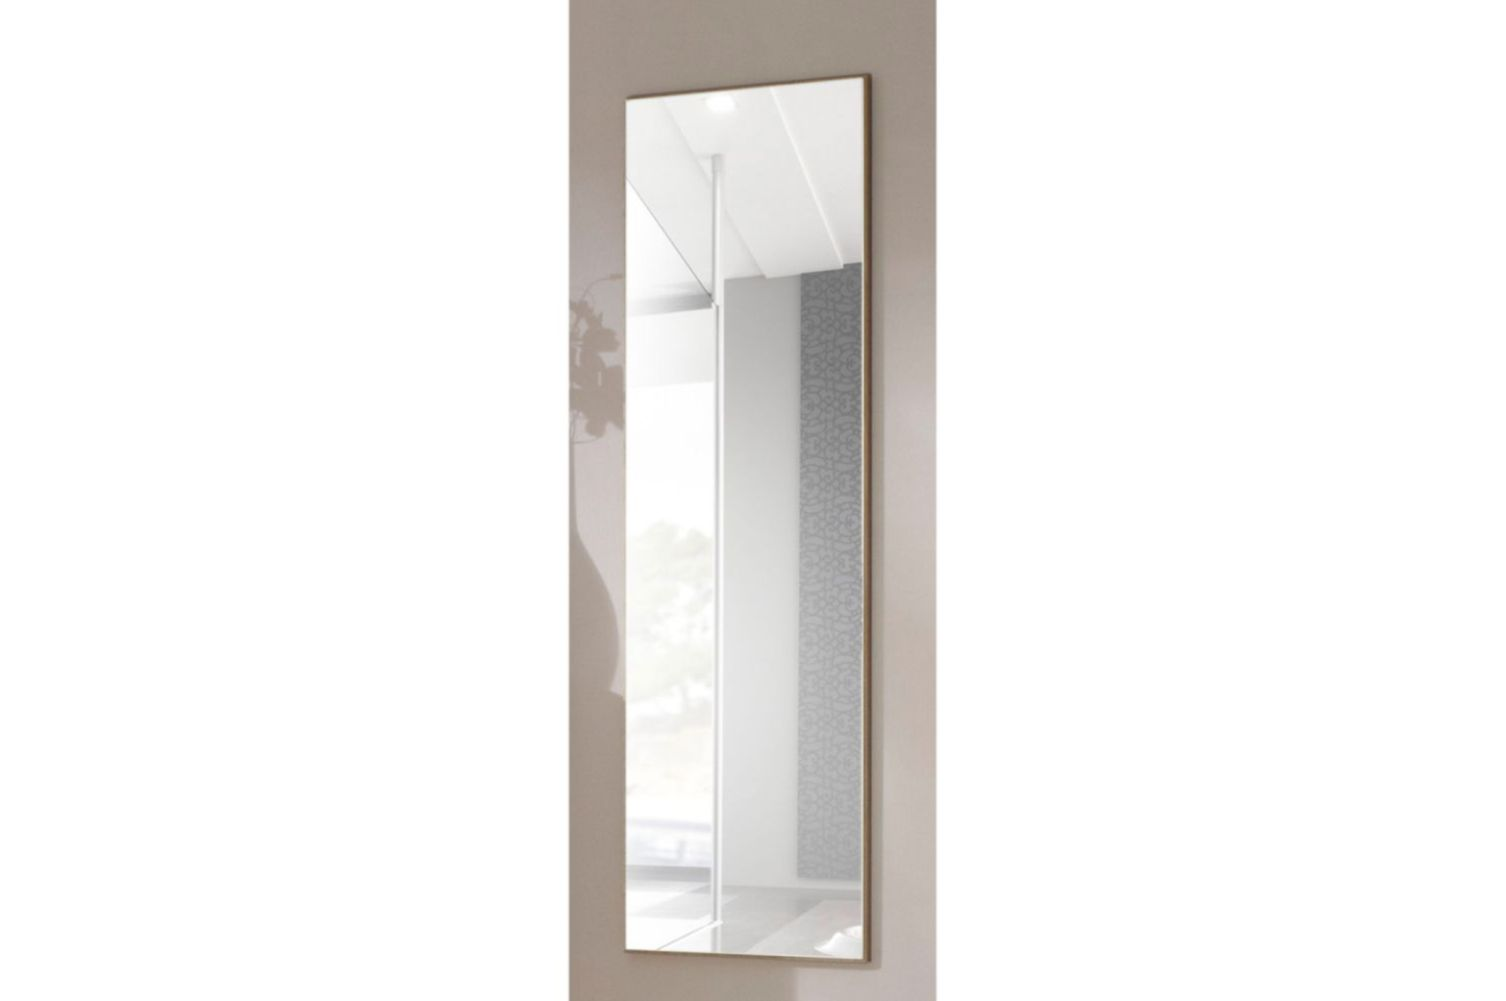 Spiegel garderobenspiegel anprobespiegel wandspiegel for Moderne wandspiegel